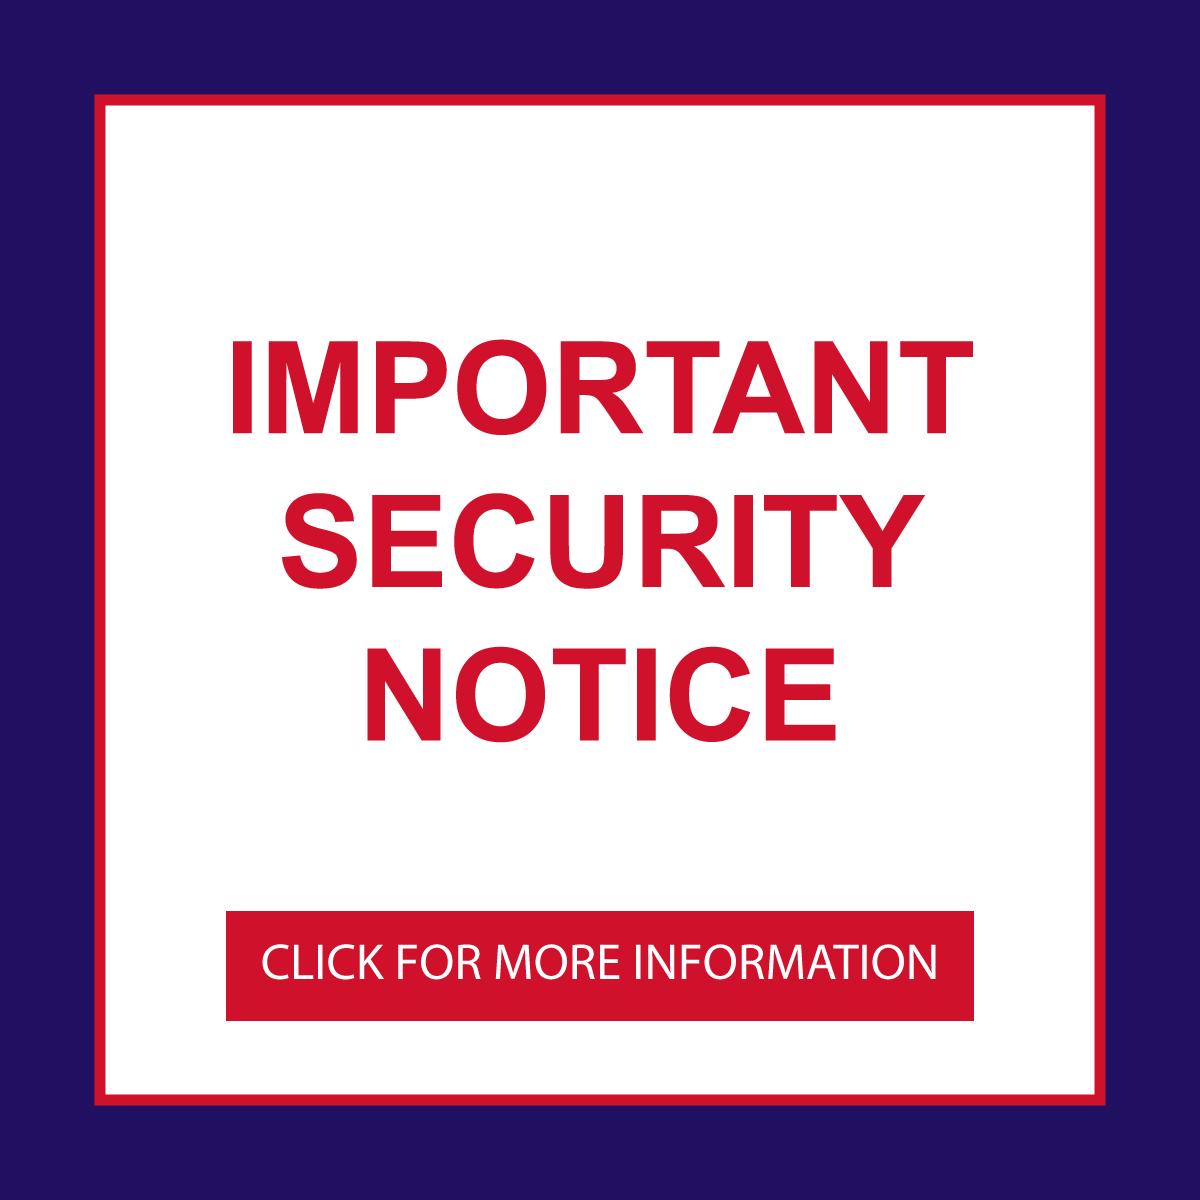 Important-Security-Notice-WIDGET